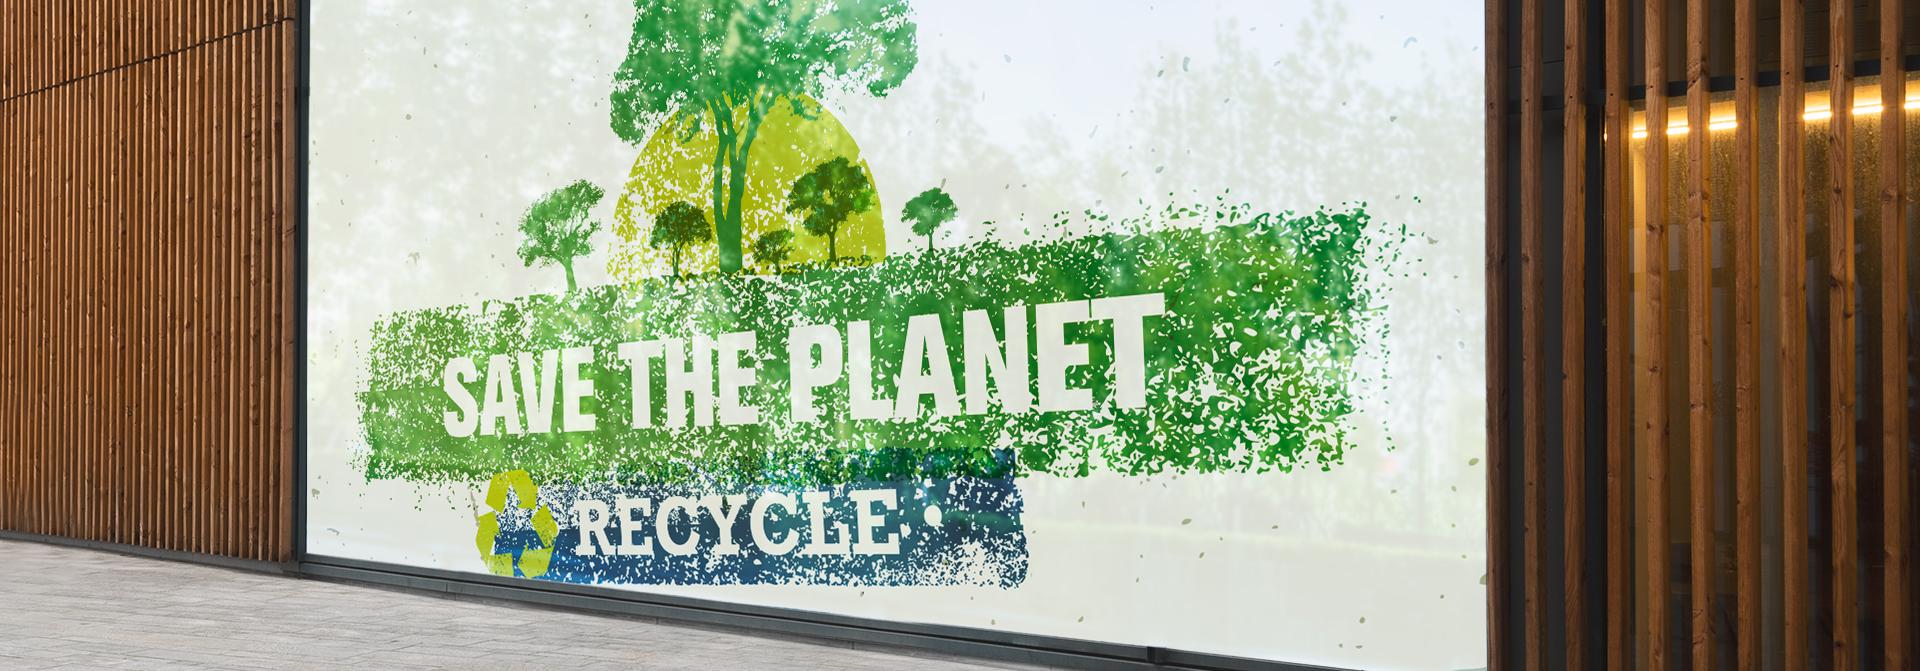 eco friendly business venue